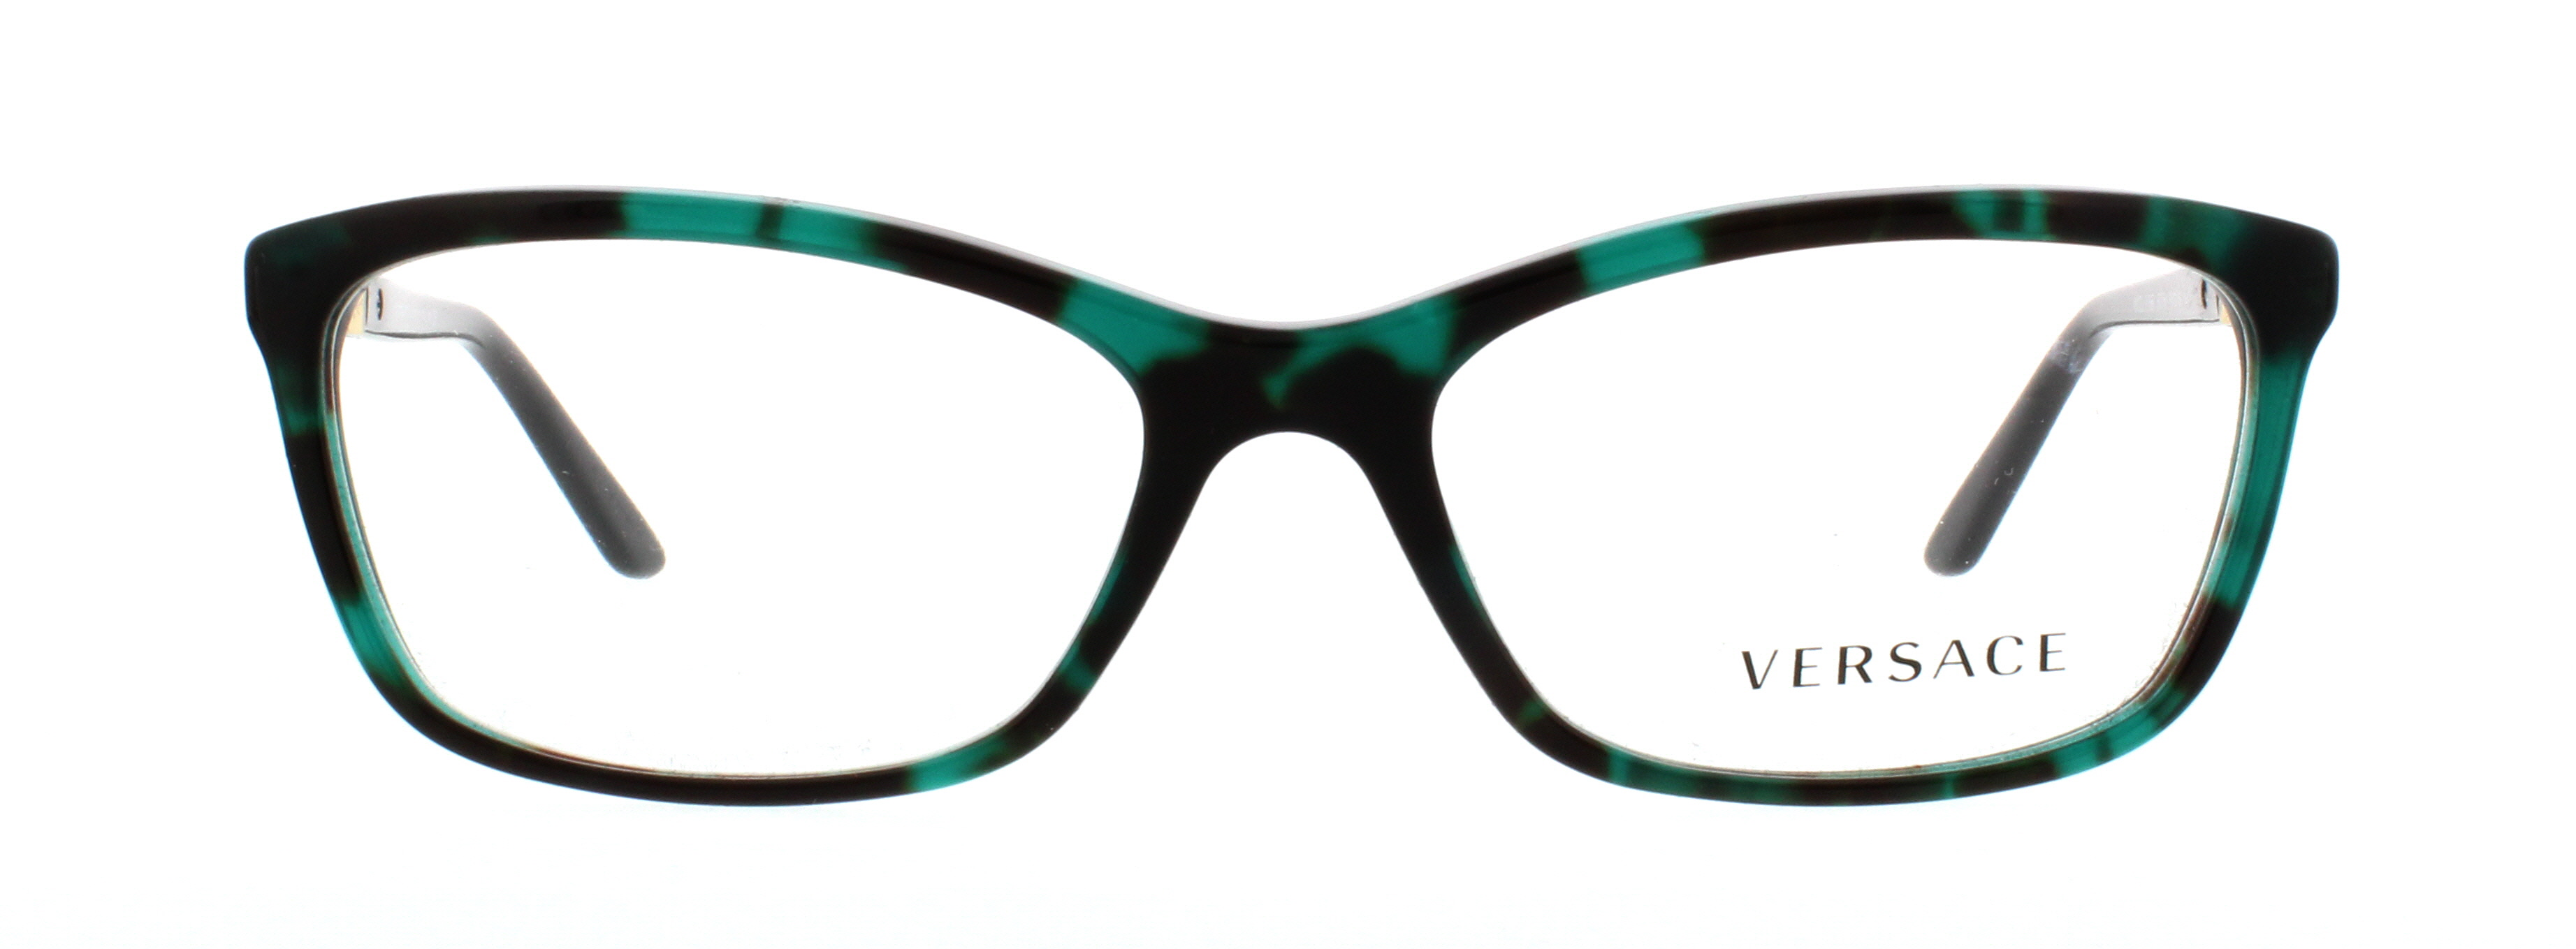 22b113bd2765 VERSACE Eyeglasses VE 3186 5076 Green Havana 54MM - Walmart.com